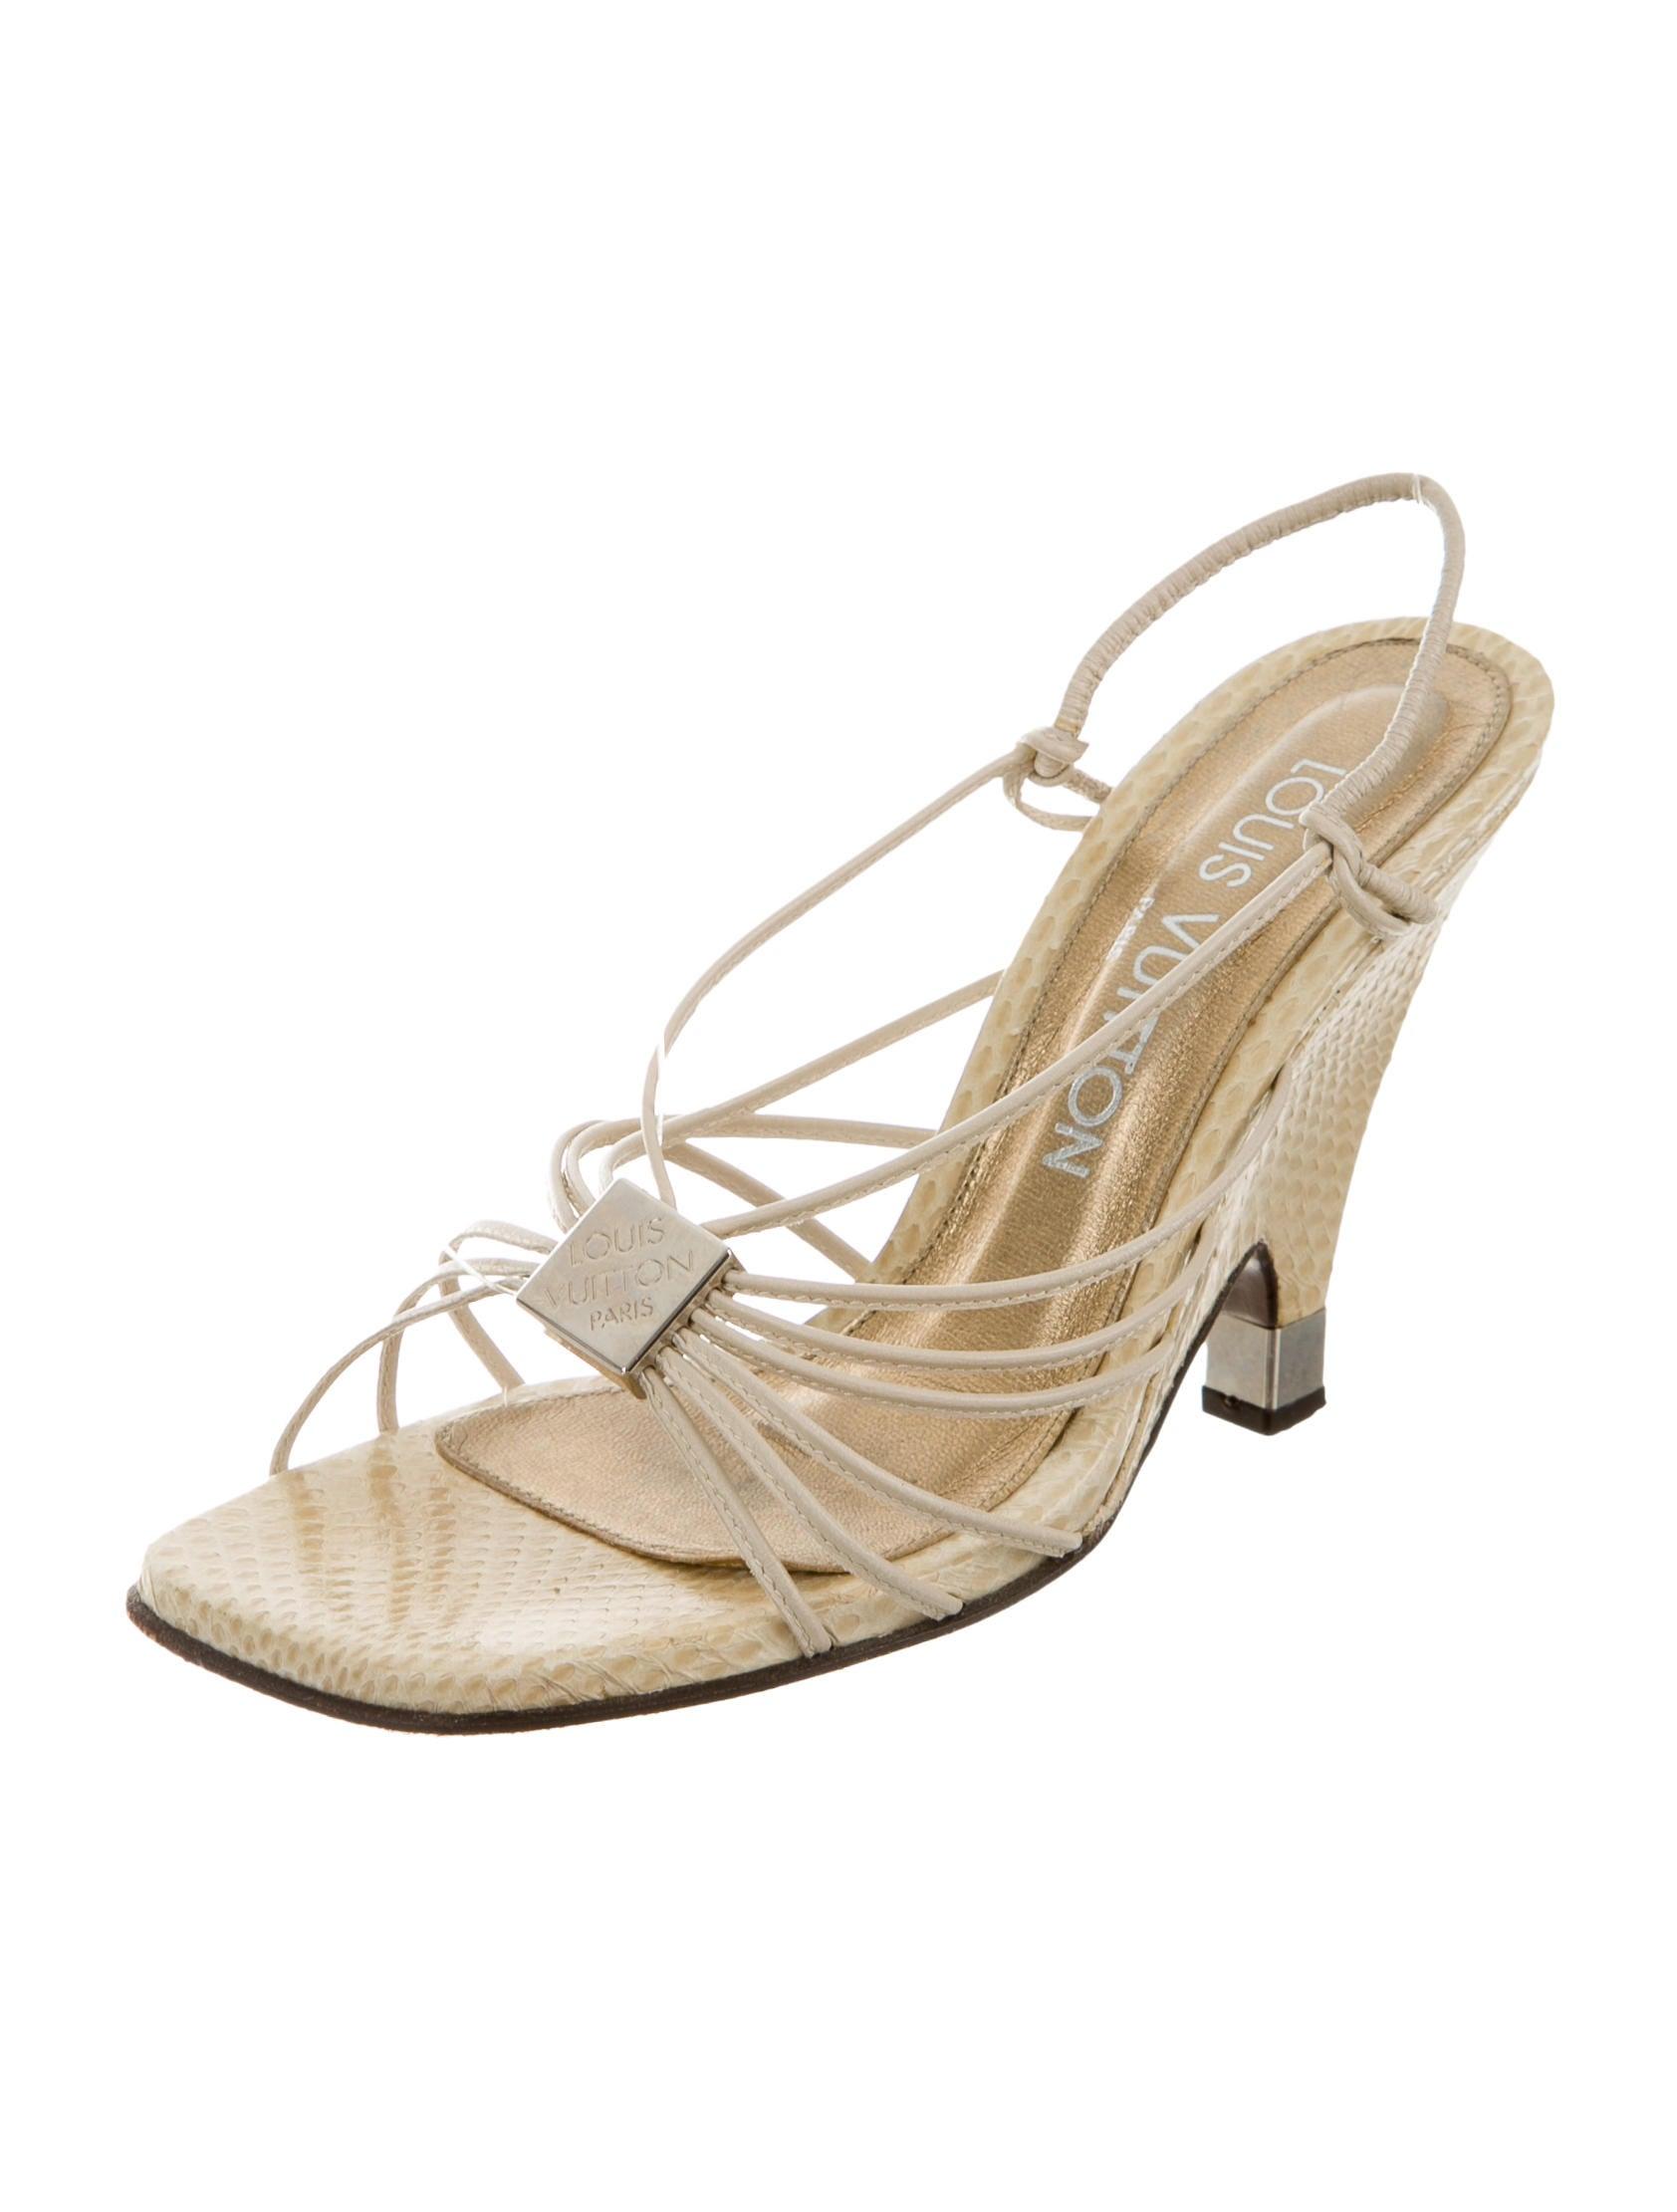 louis vuitton leather wedge sandals shoes lou91379